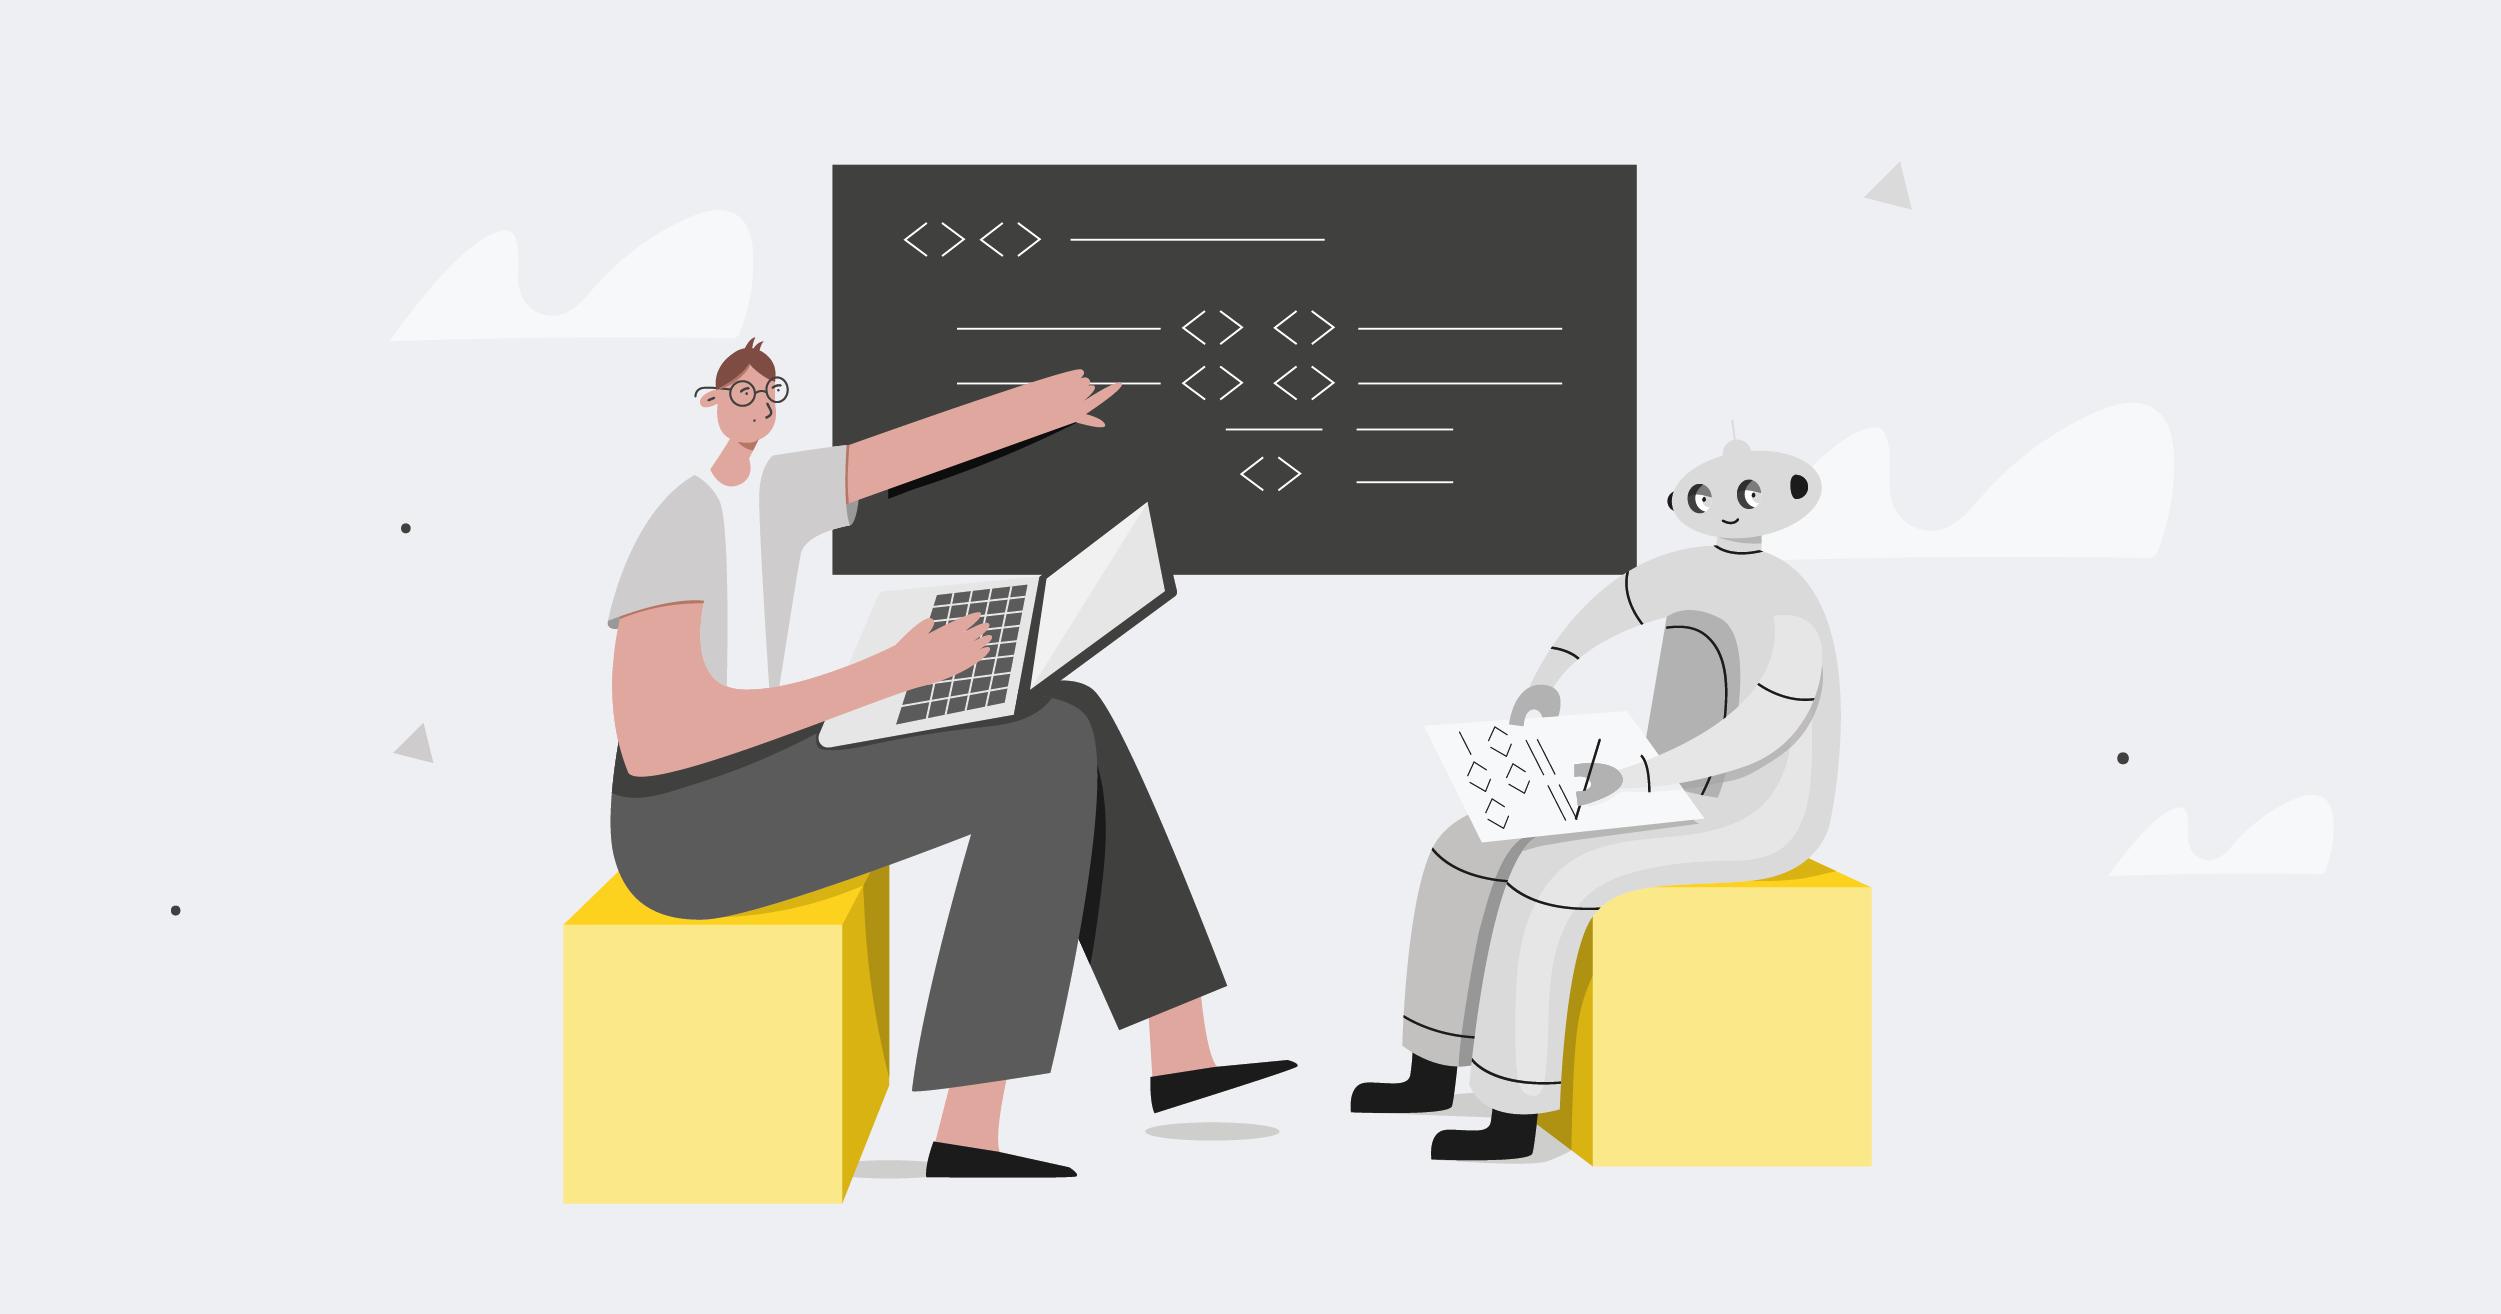 man showing robot information on blackboard